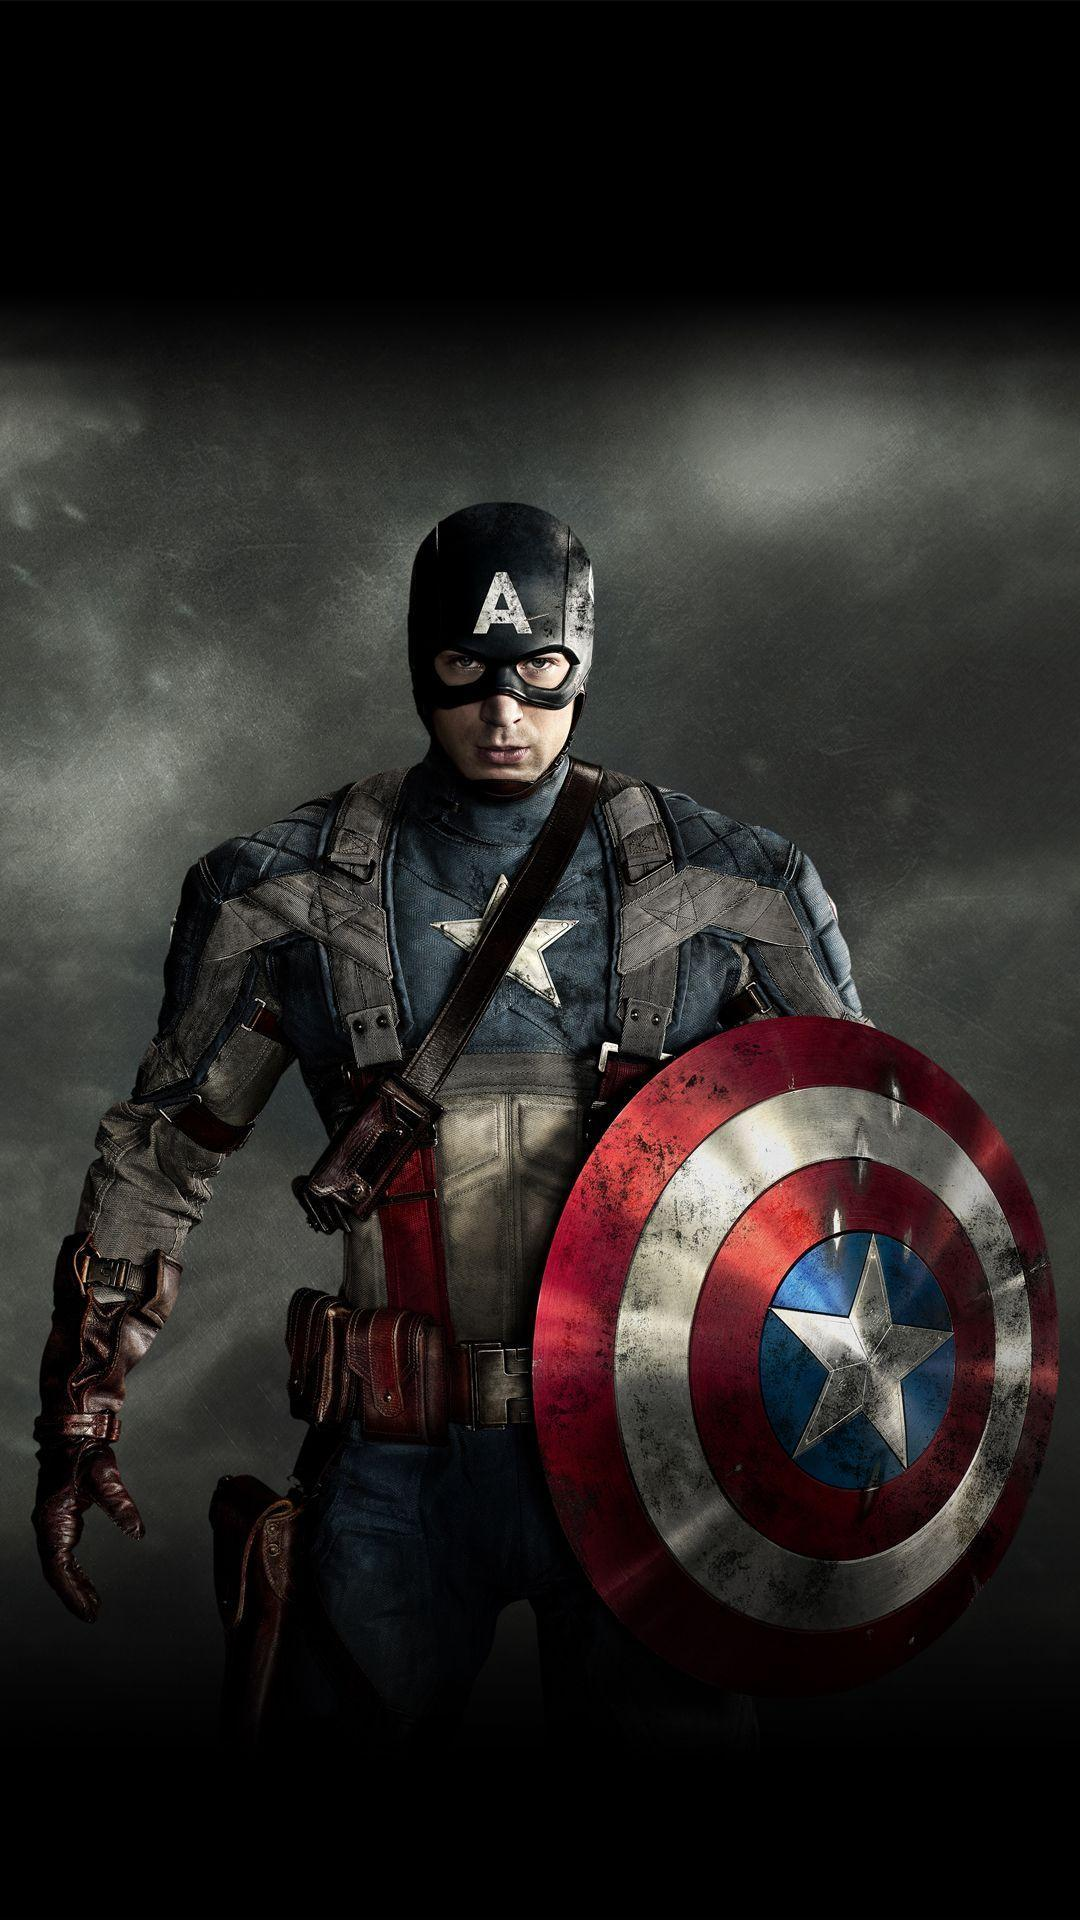 The Avengers Captain America HTC hd wallpaper